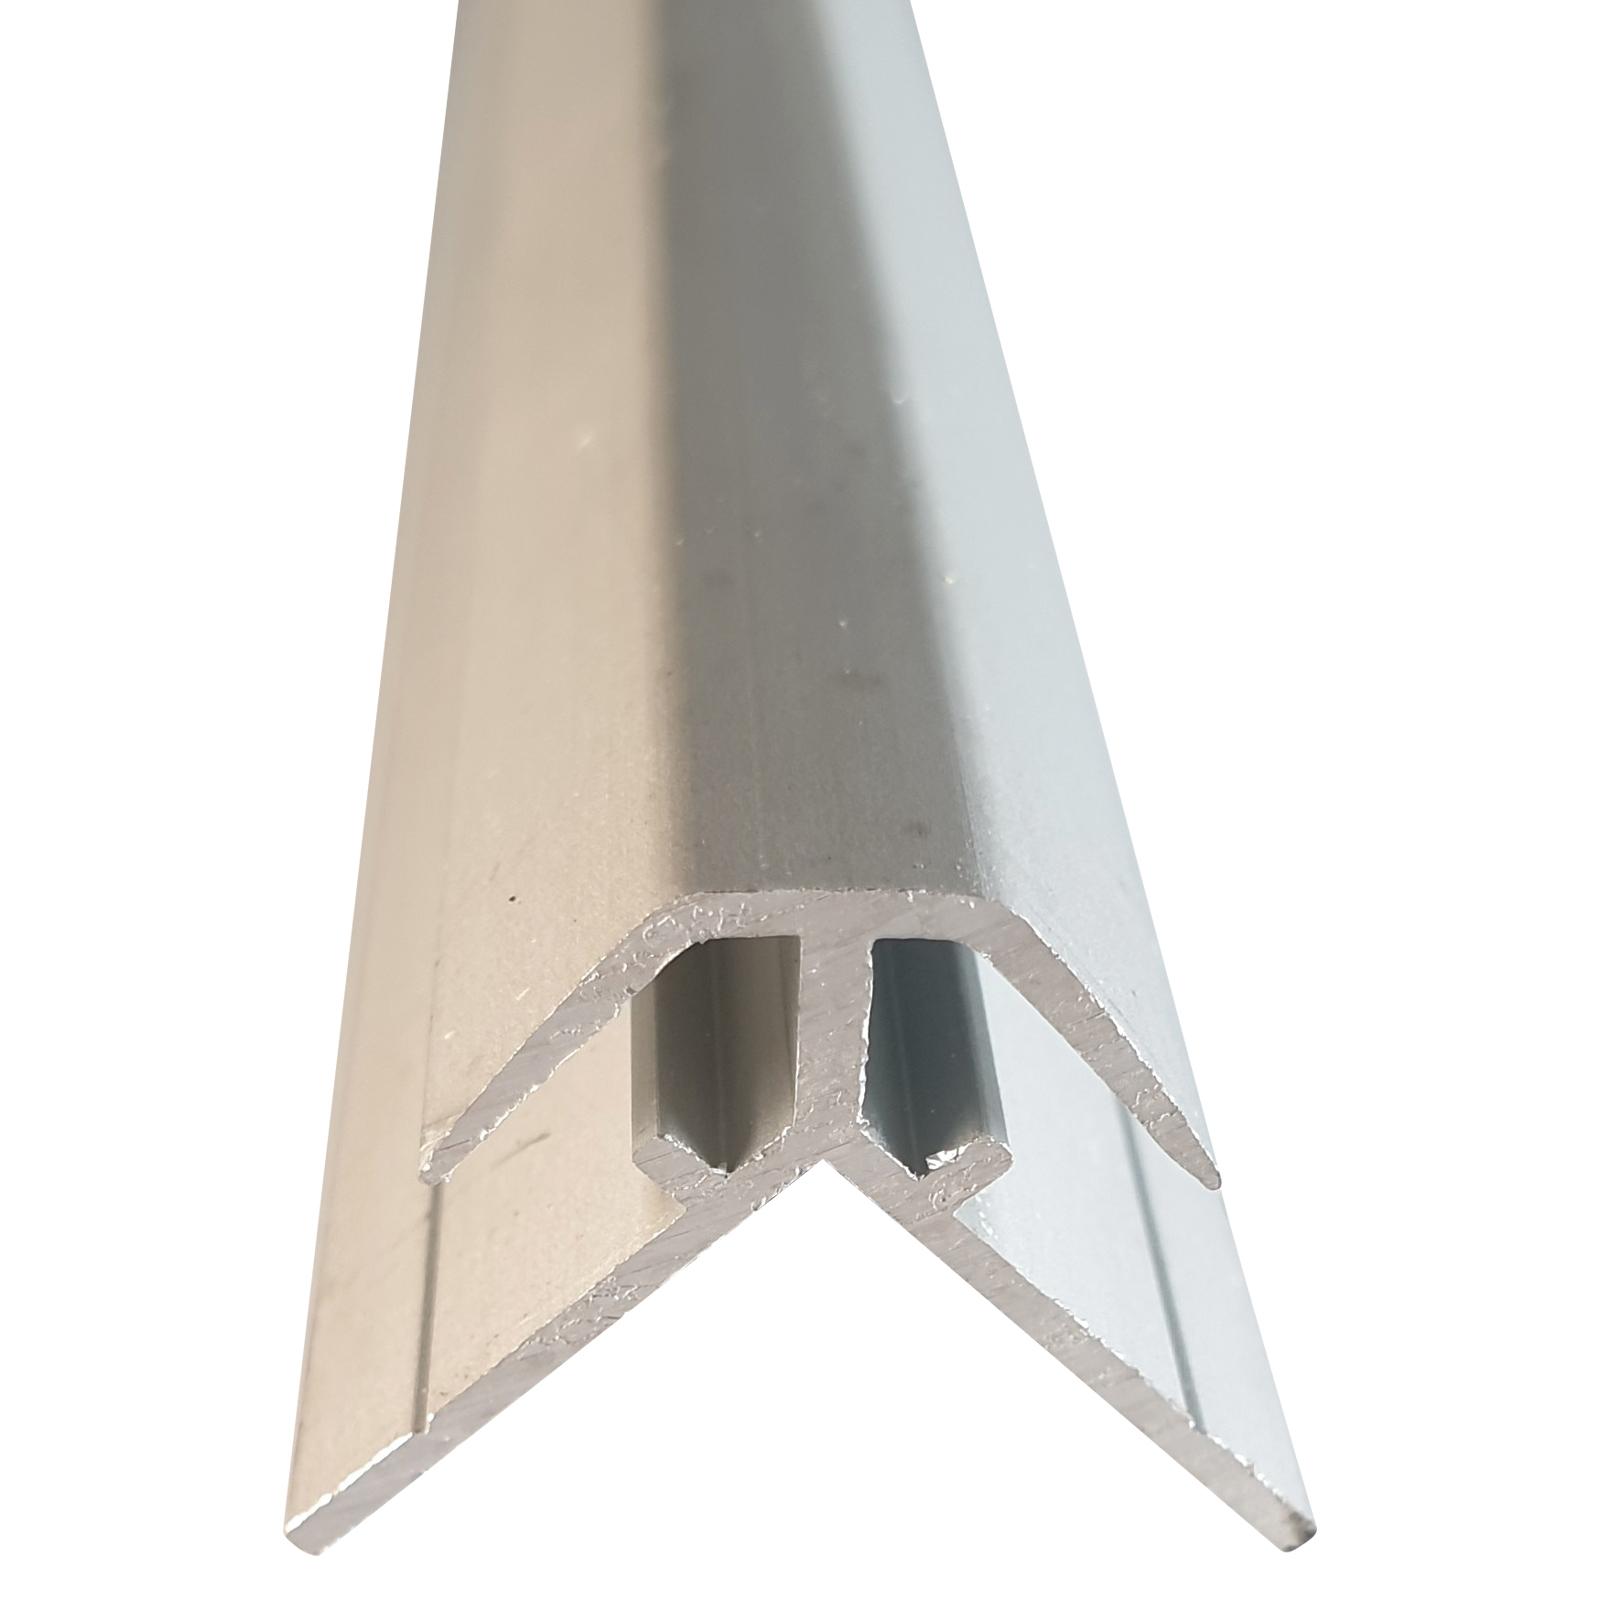 DesignerSplash 3200mm External Corner Jointer